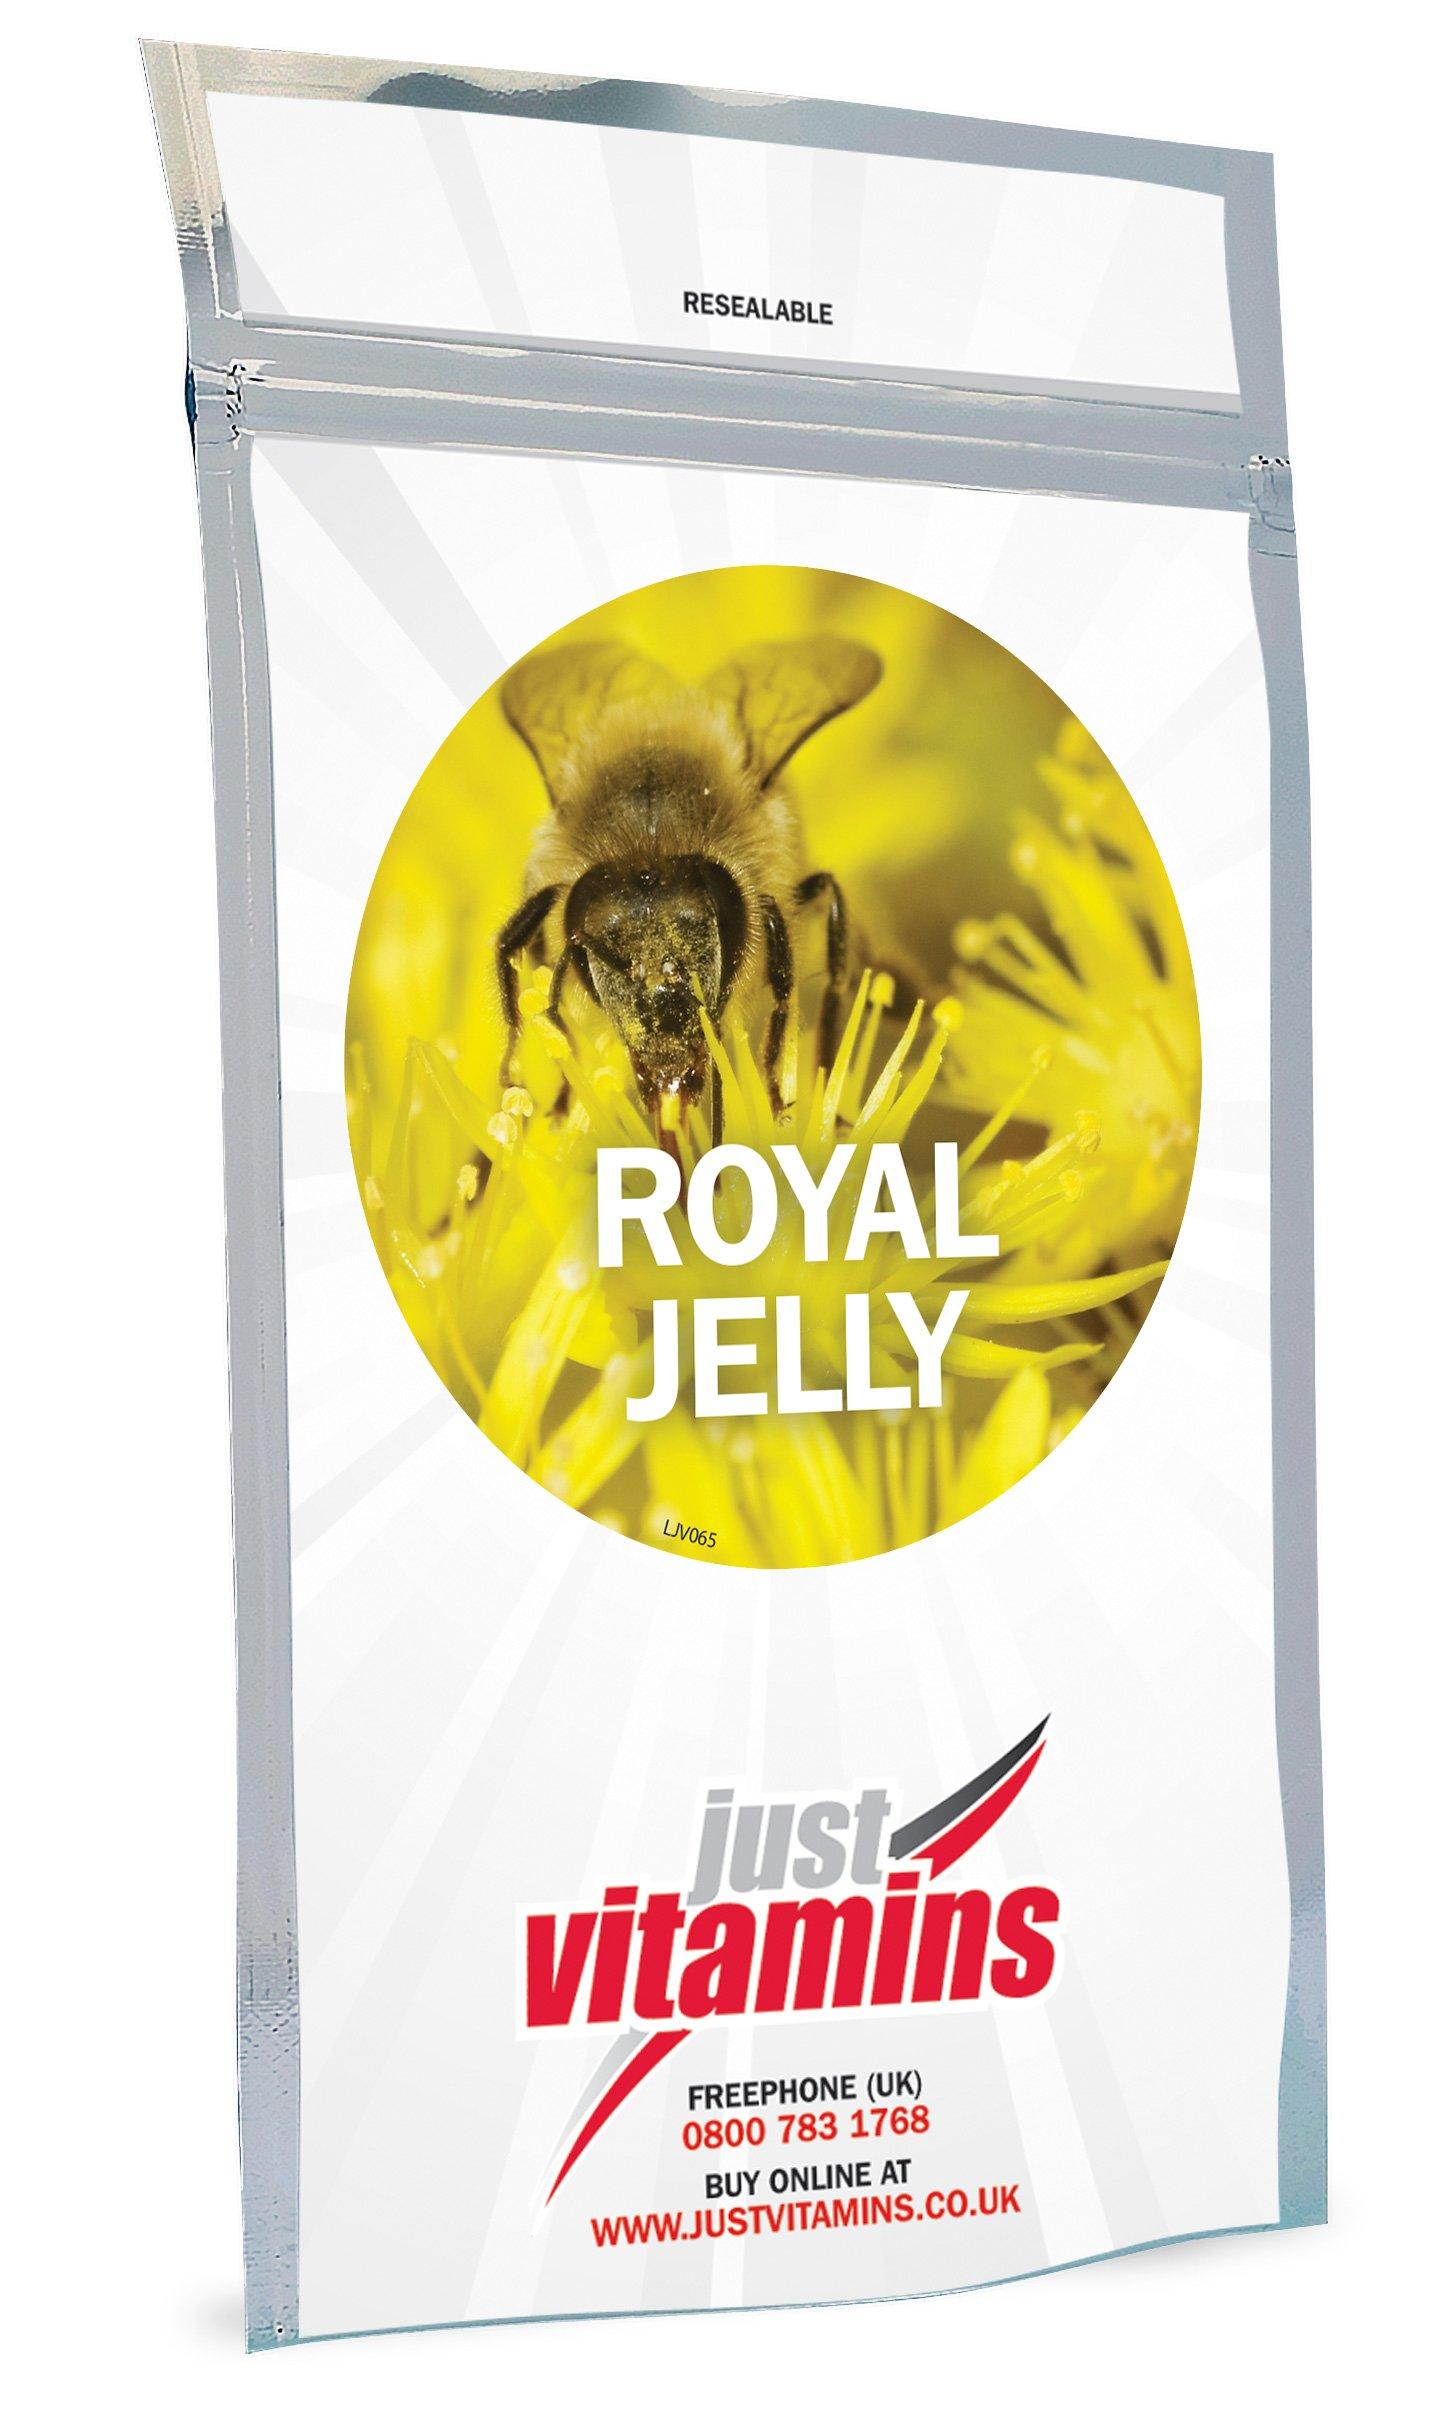 Just Vitamins Royal Jelly 500mg 360 Capsules by Just Vitamins